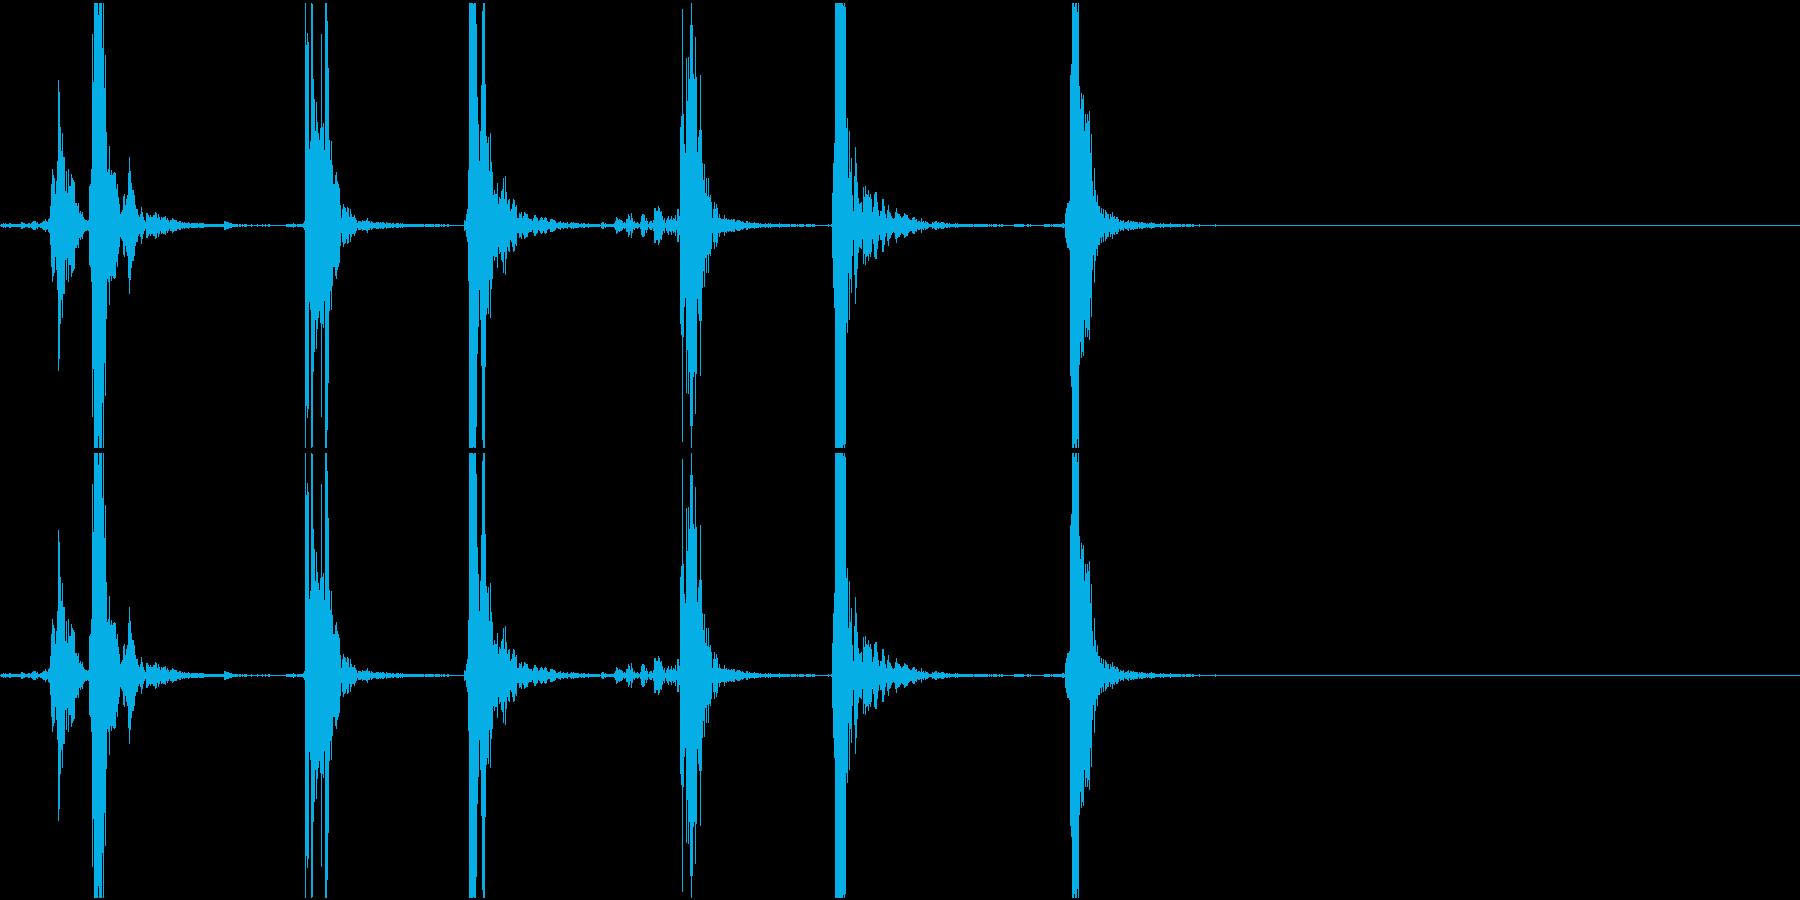 Typing キーボード 3連打音 PCの再生済みの波形